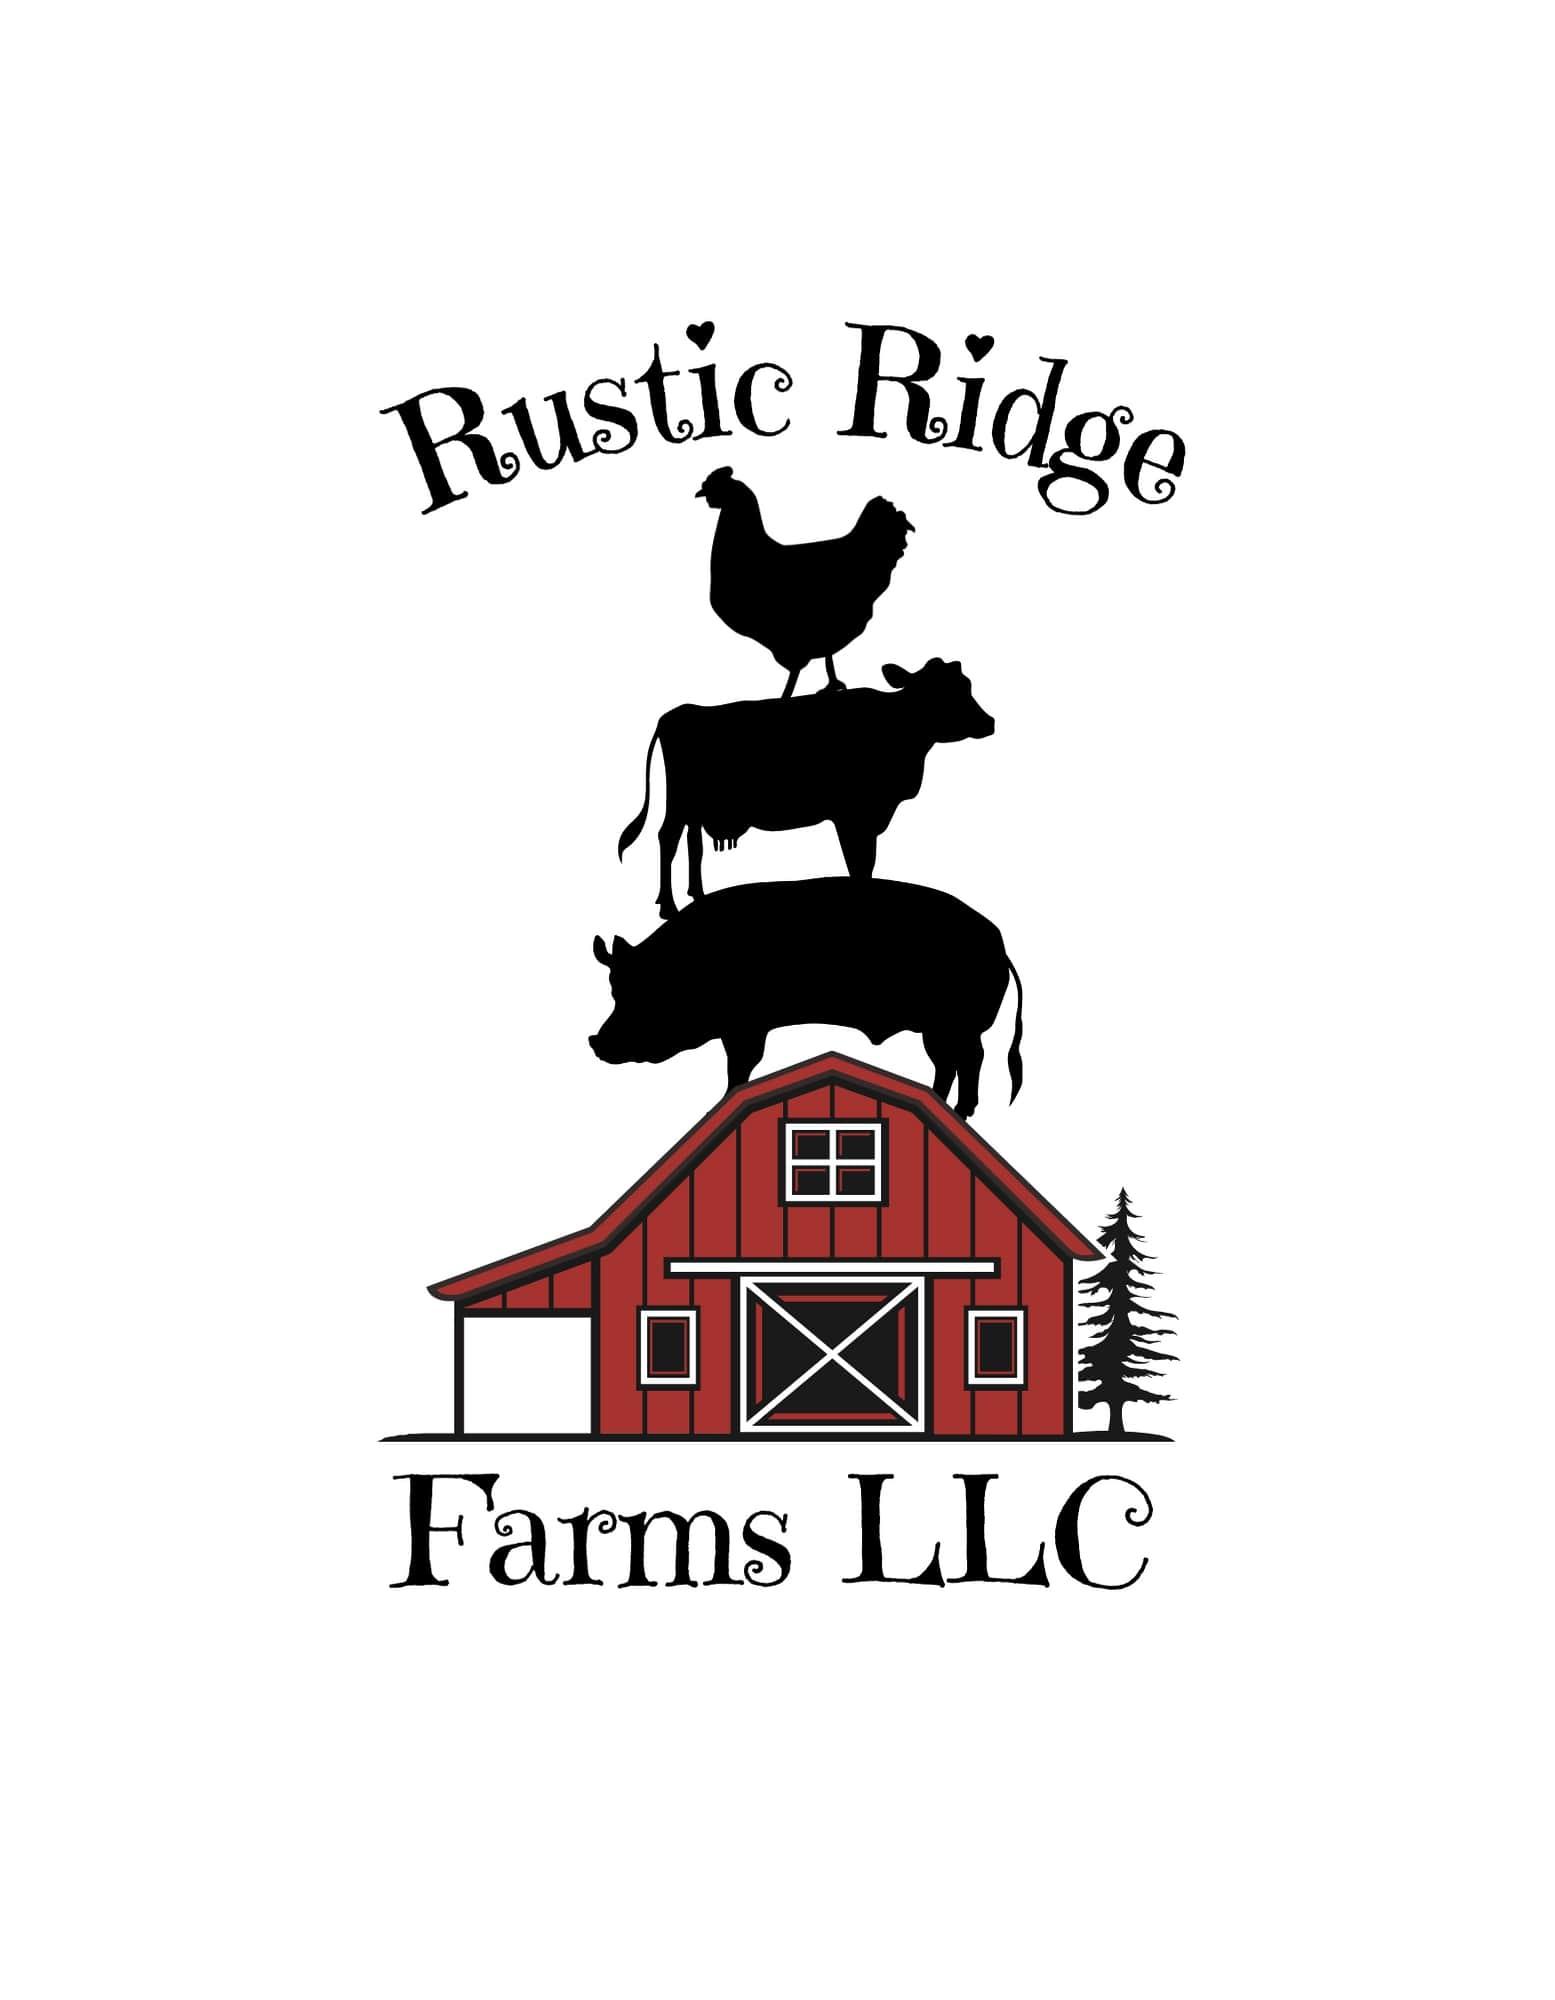 Rustic Ridge Farms, LLC